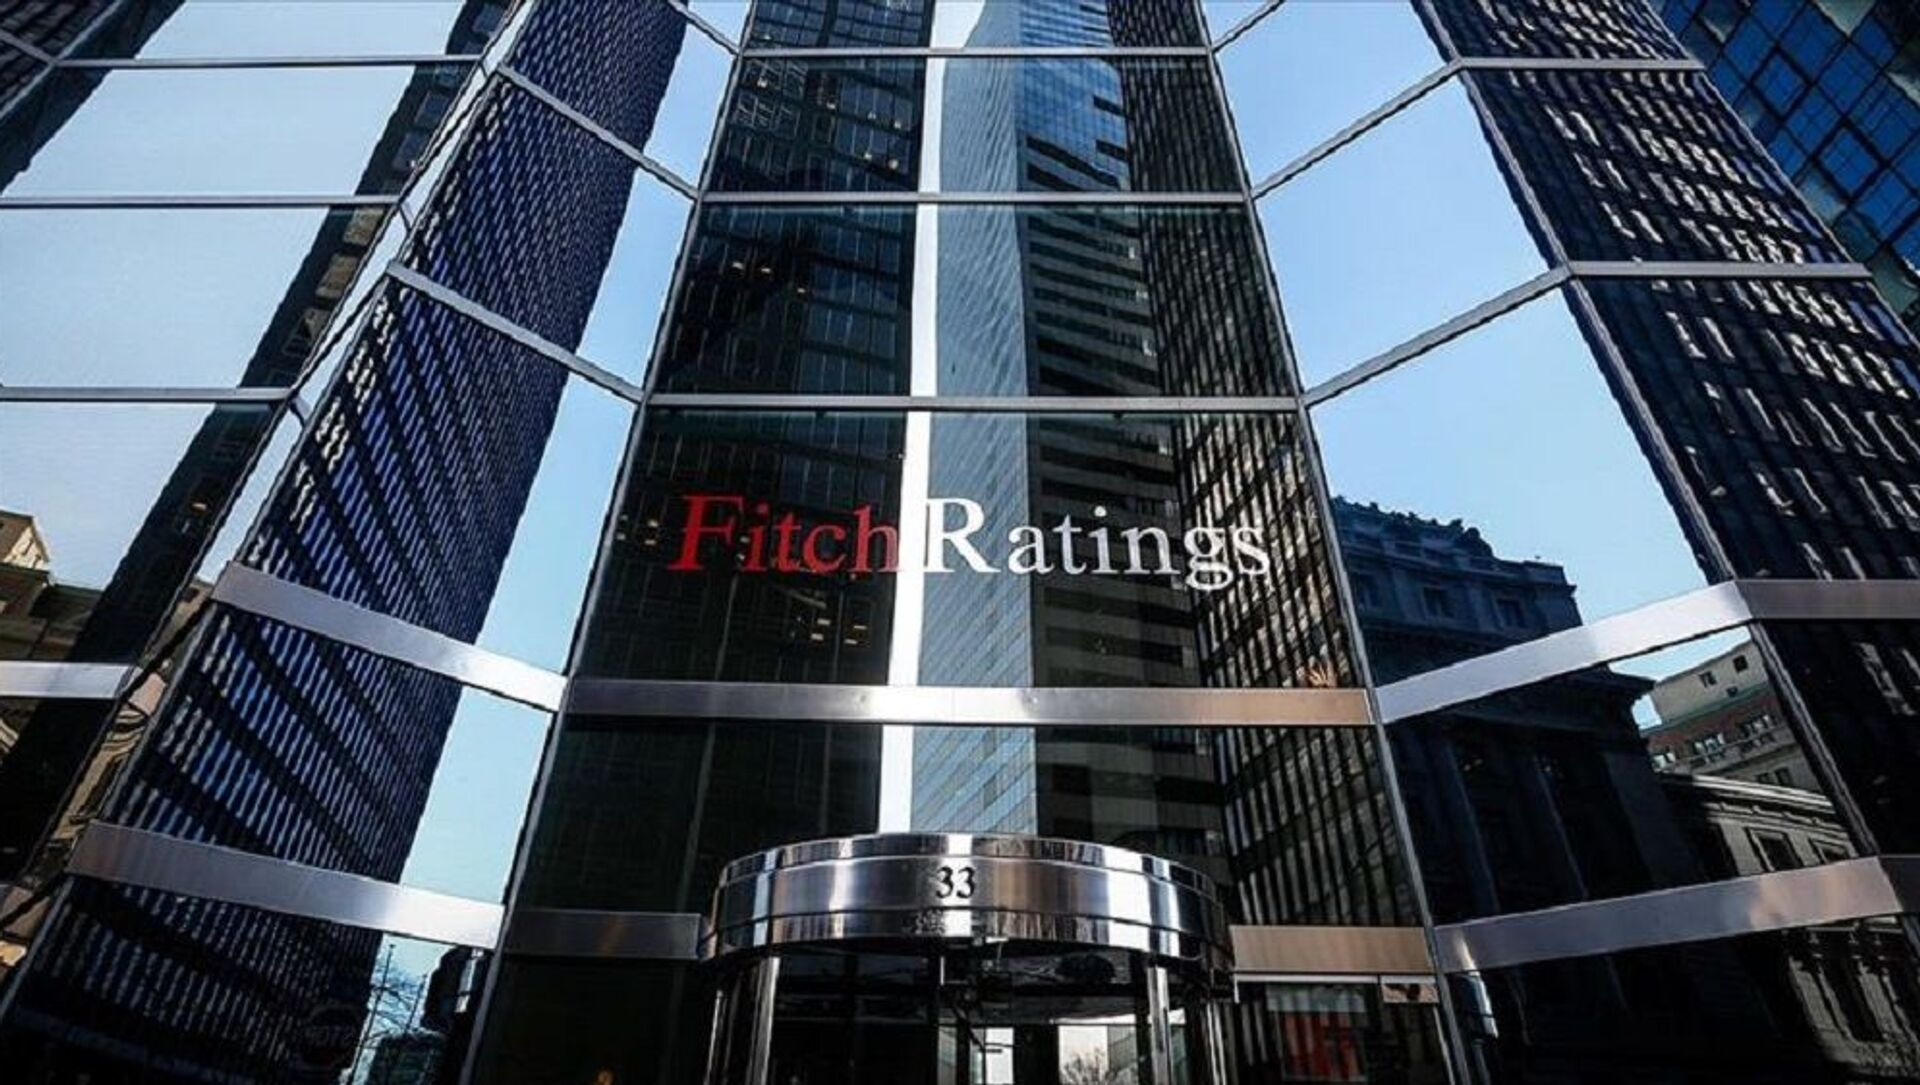 Fitch Ratings - Sputnik Türkiye, 1920, 02.02.2021